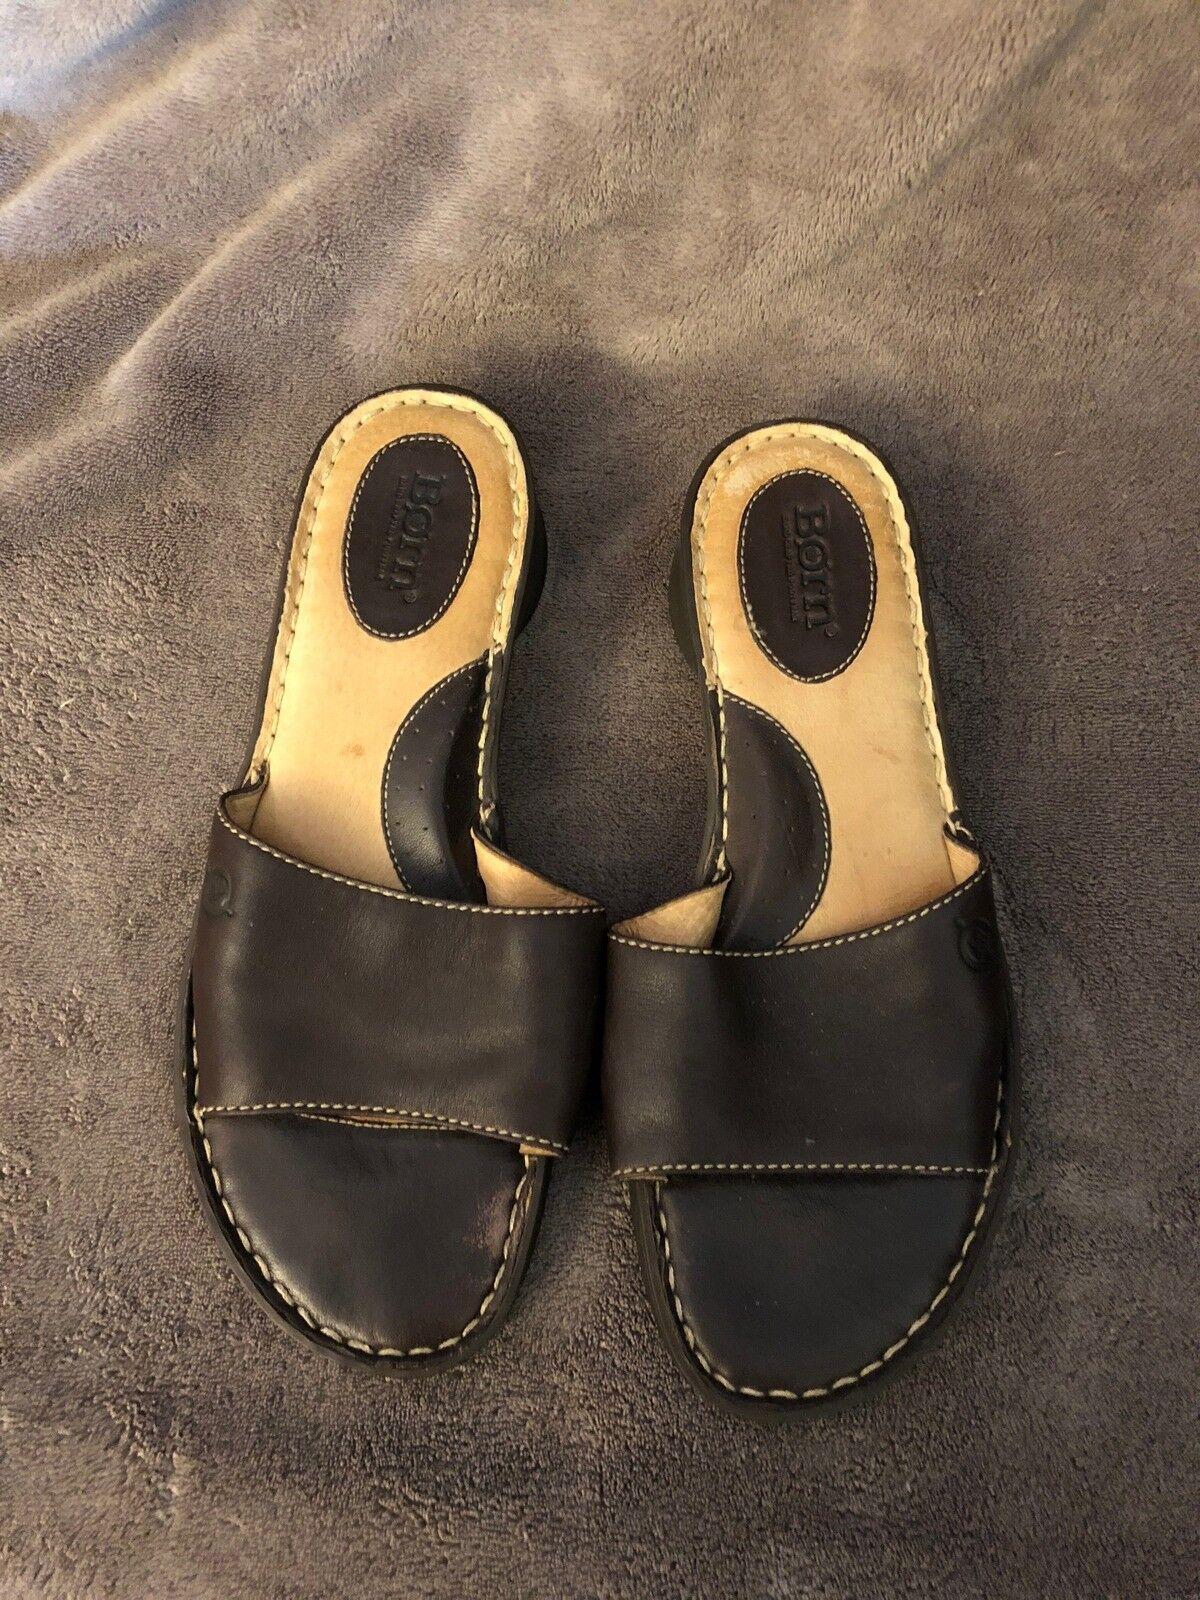 Women's Born Brown Leather Slip 8 On Slides Sandals Size 8 Slip M W8585 B6 ee9c43